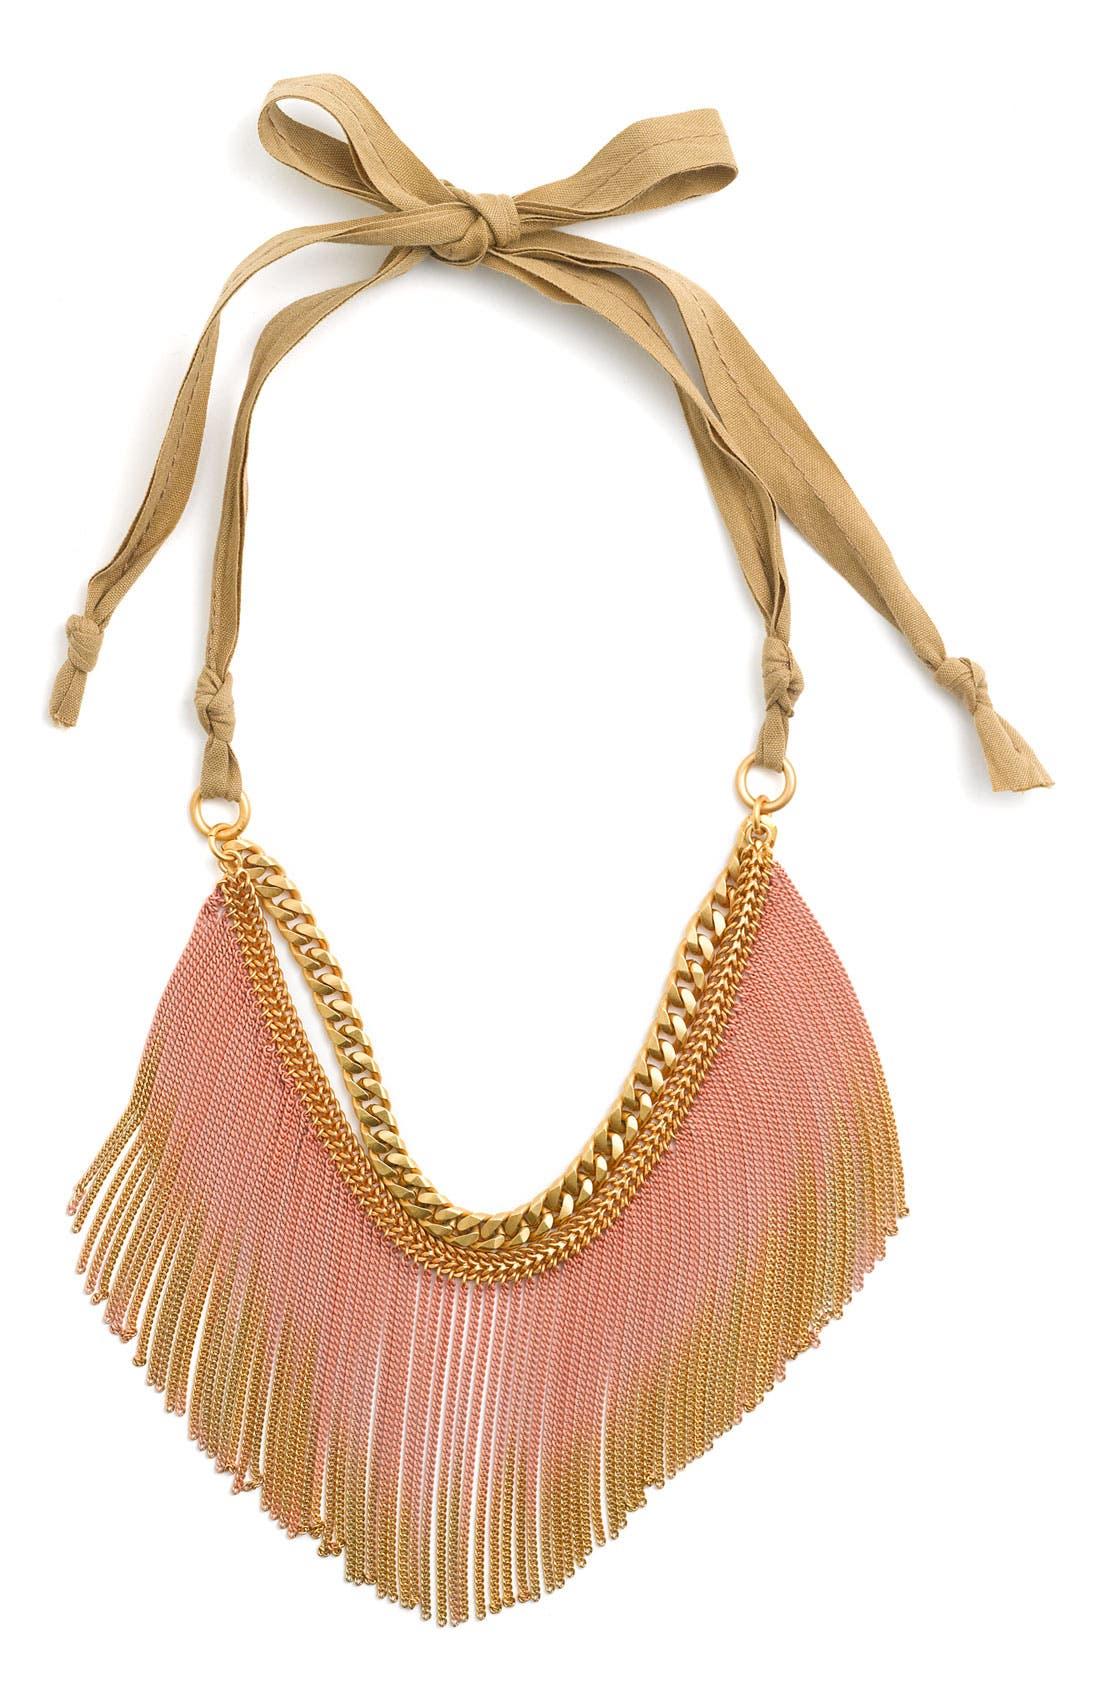 Alternate Image 1 Selected - Juicy Couture 'Wanderlust' Gradient Fringe Necklace